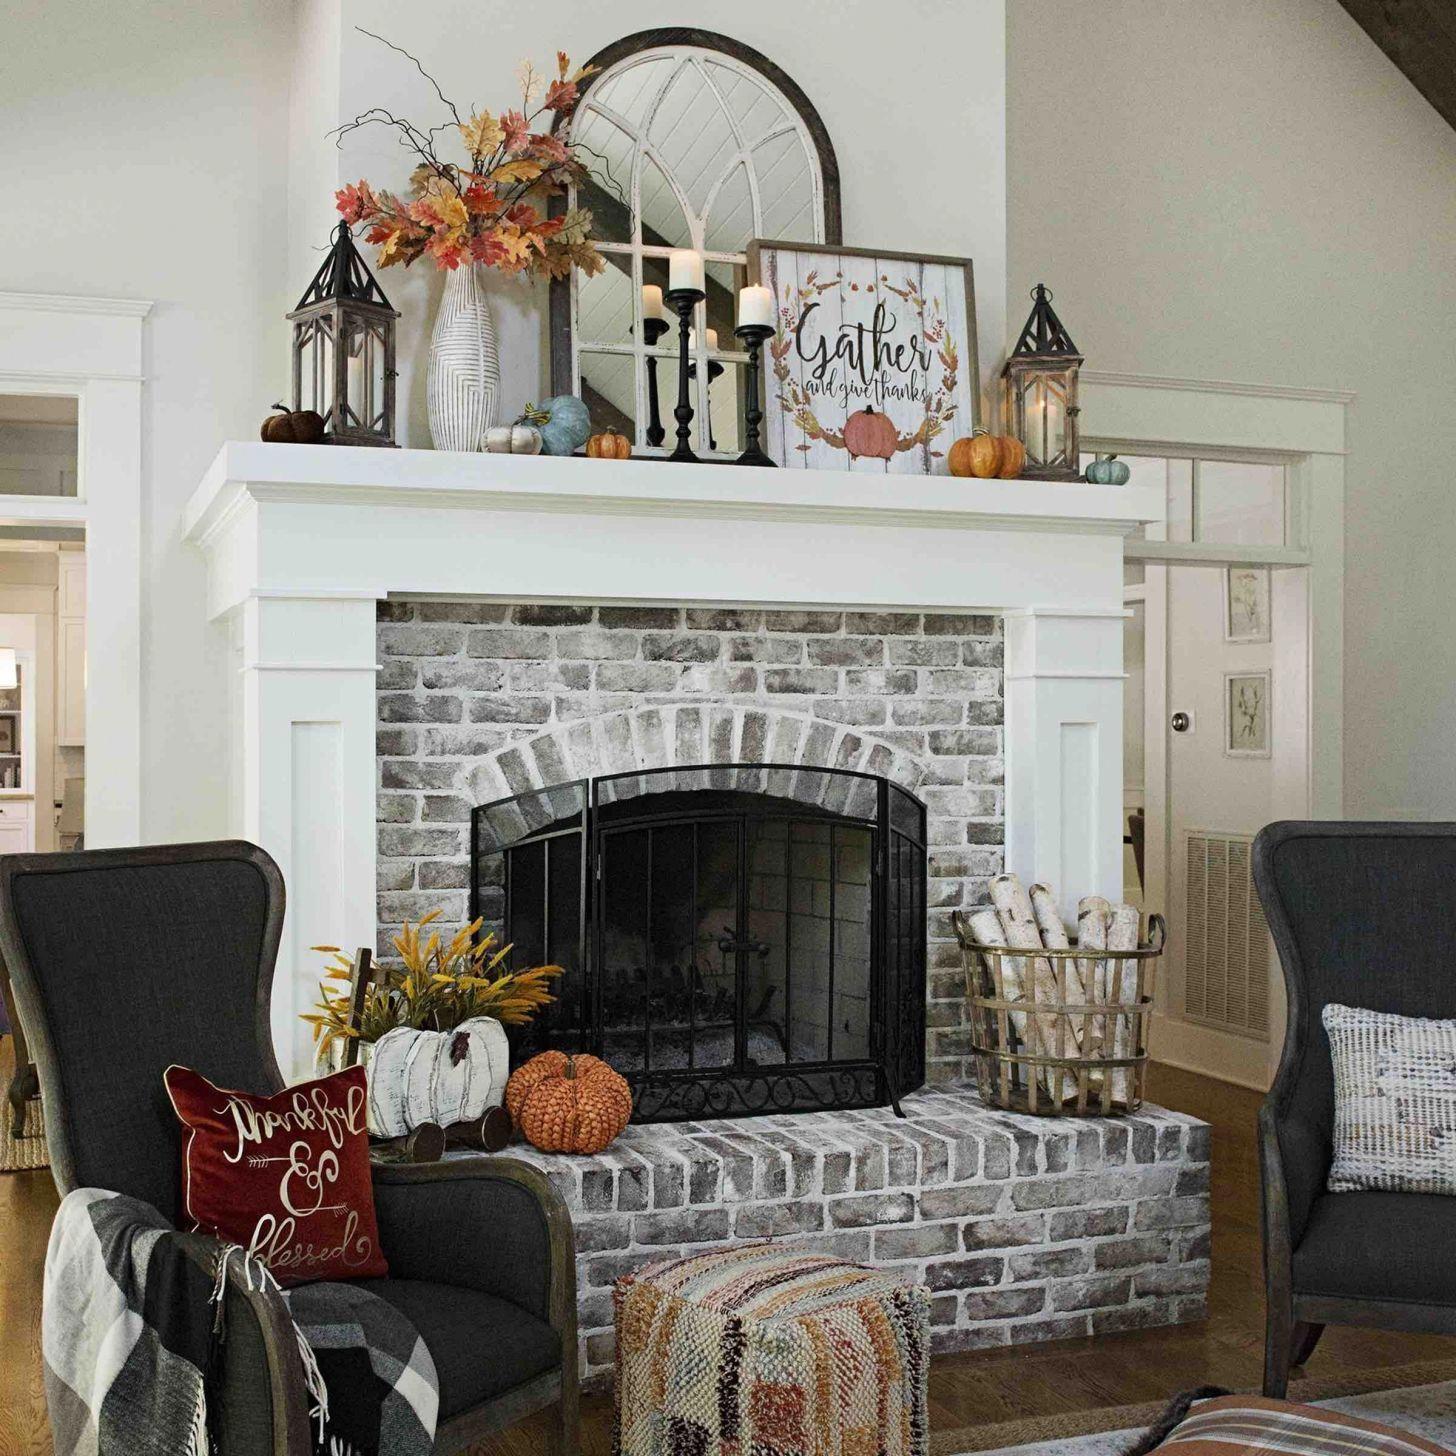 Unique Fireplace Diy Fireplacediy Fireplace Mantel Decor Fireplace Mantels Fireplace Design